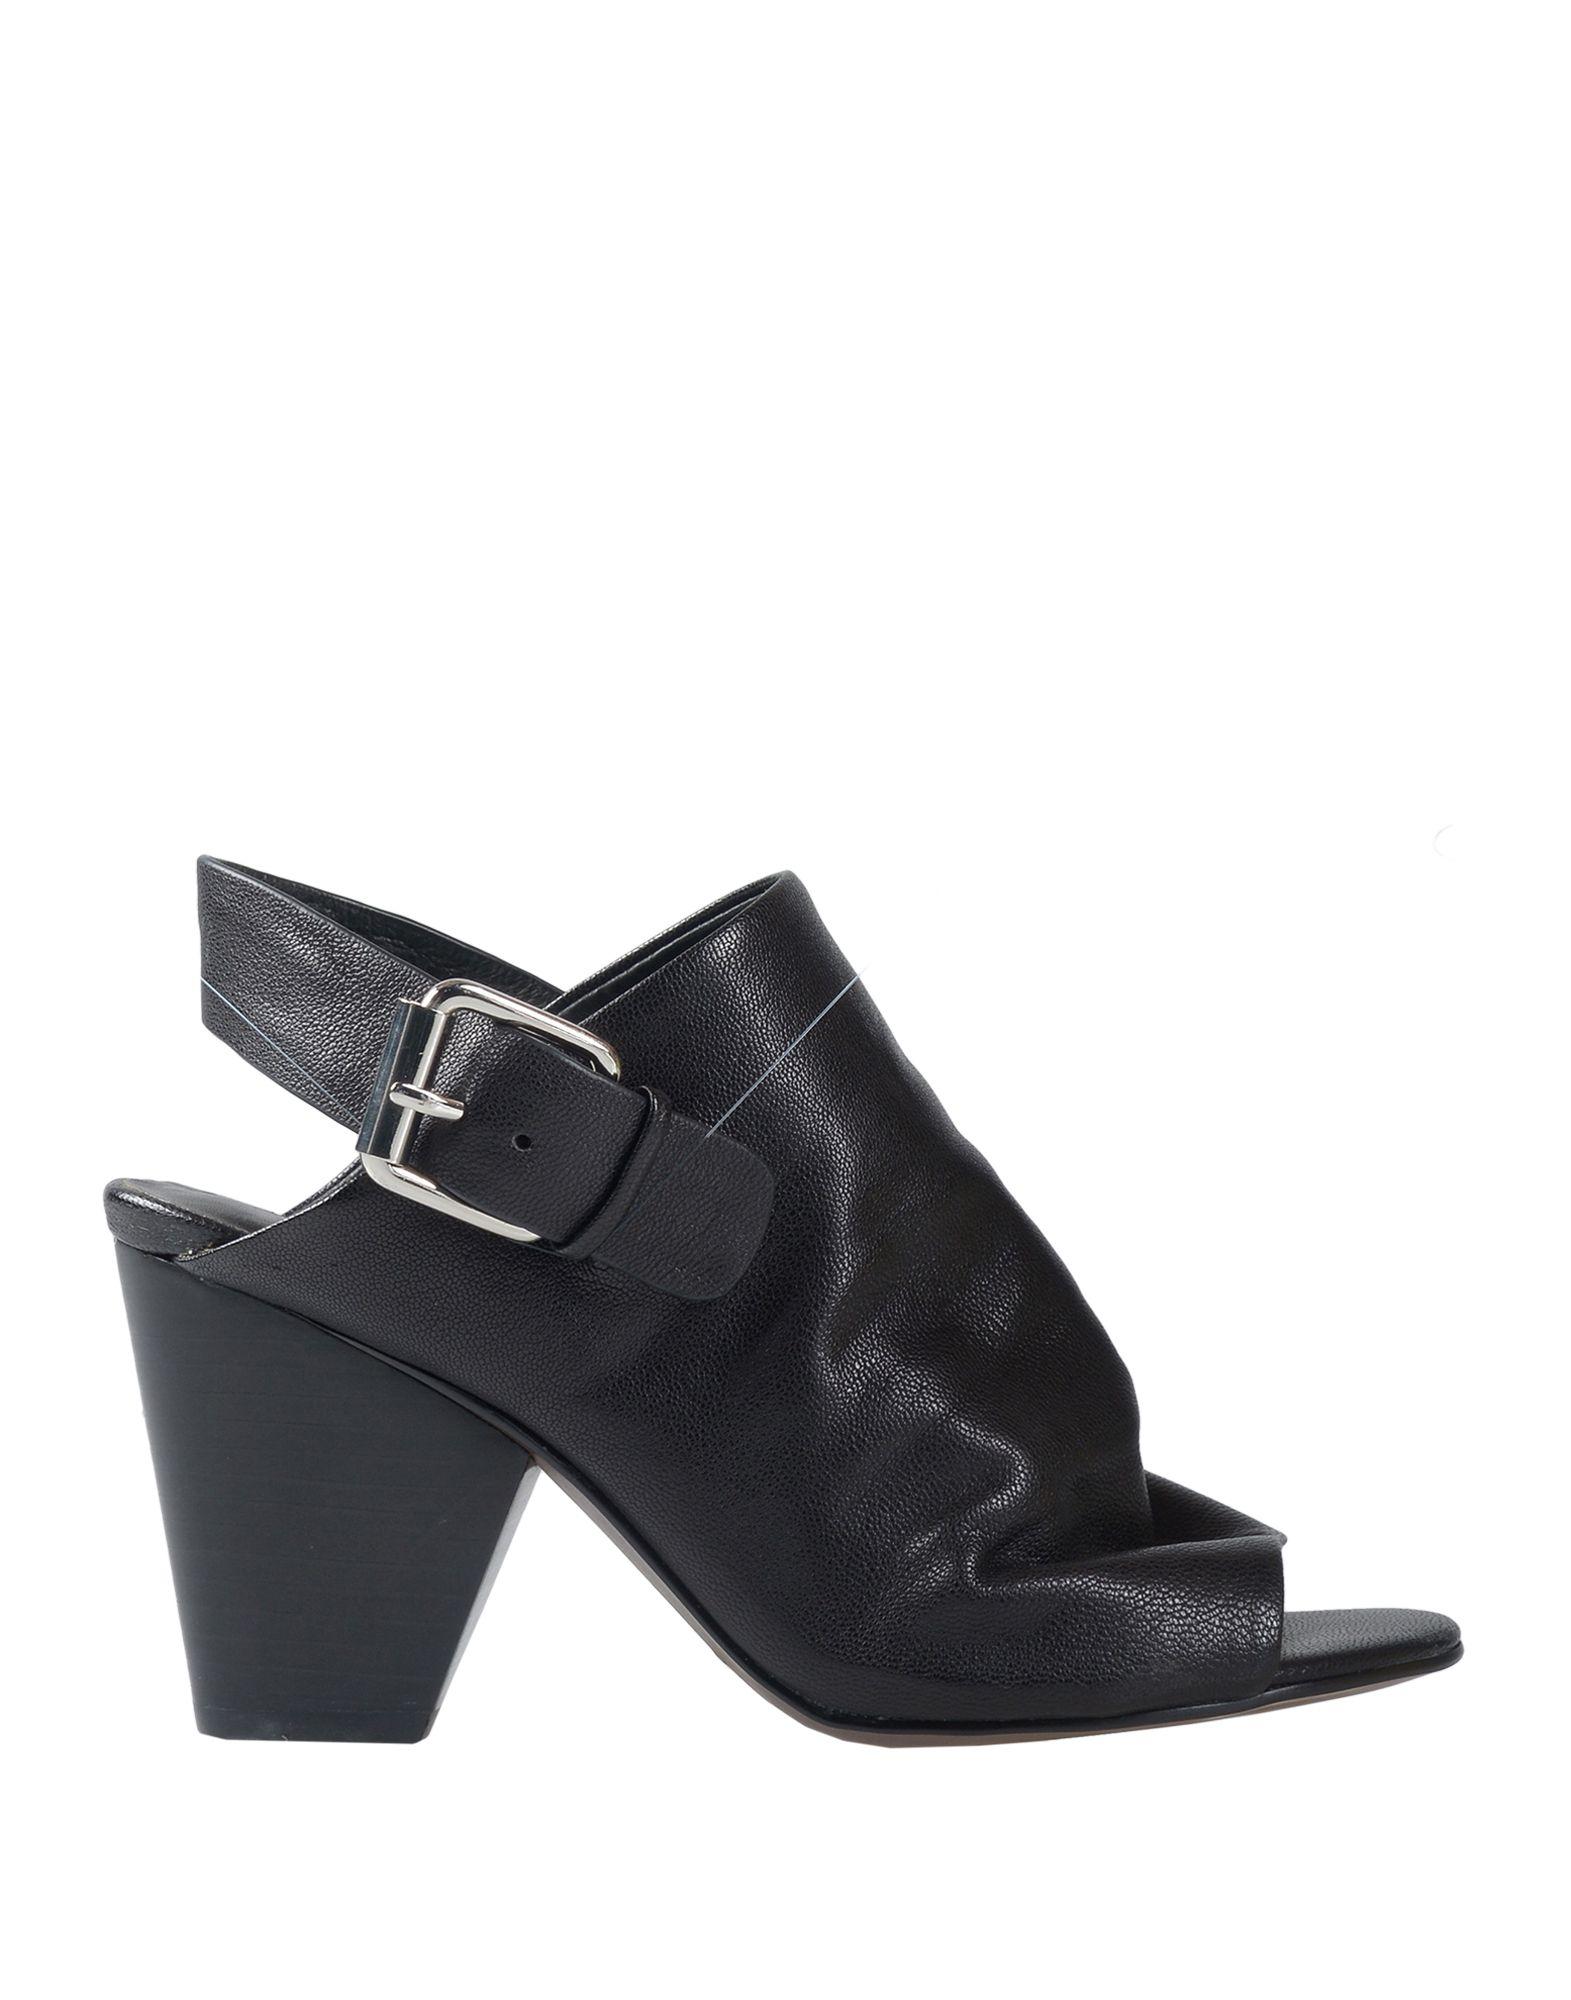 LA FEMME PLUS Сандалии sorbern plus size women pumps zapatos mujer ladies party shoes real pvc ladies party pumps custom color chaussure femme shoes